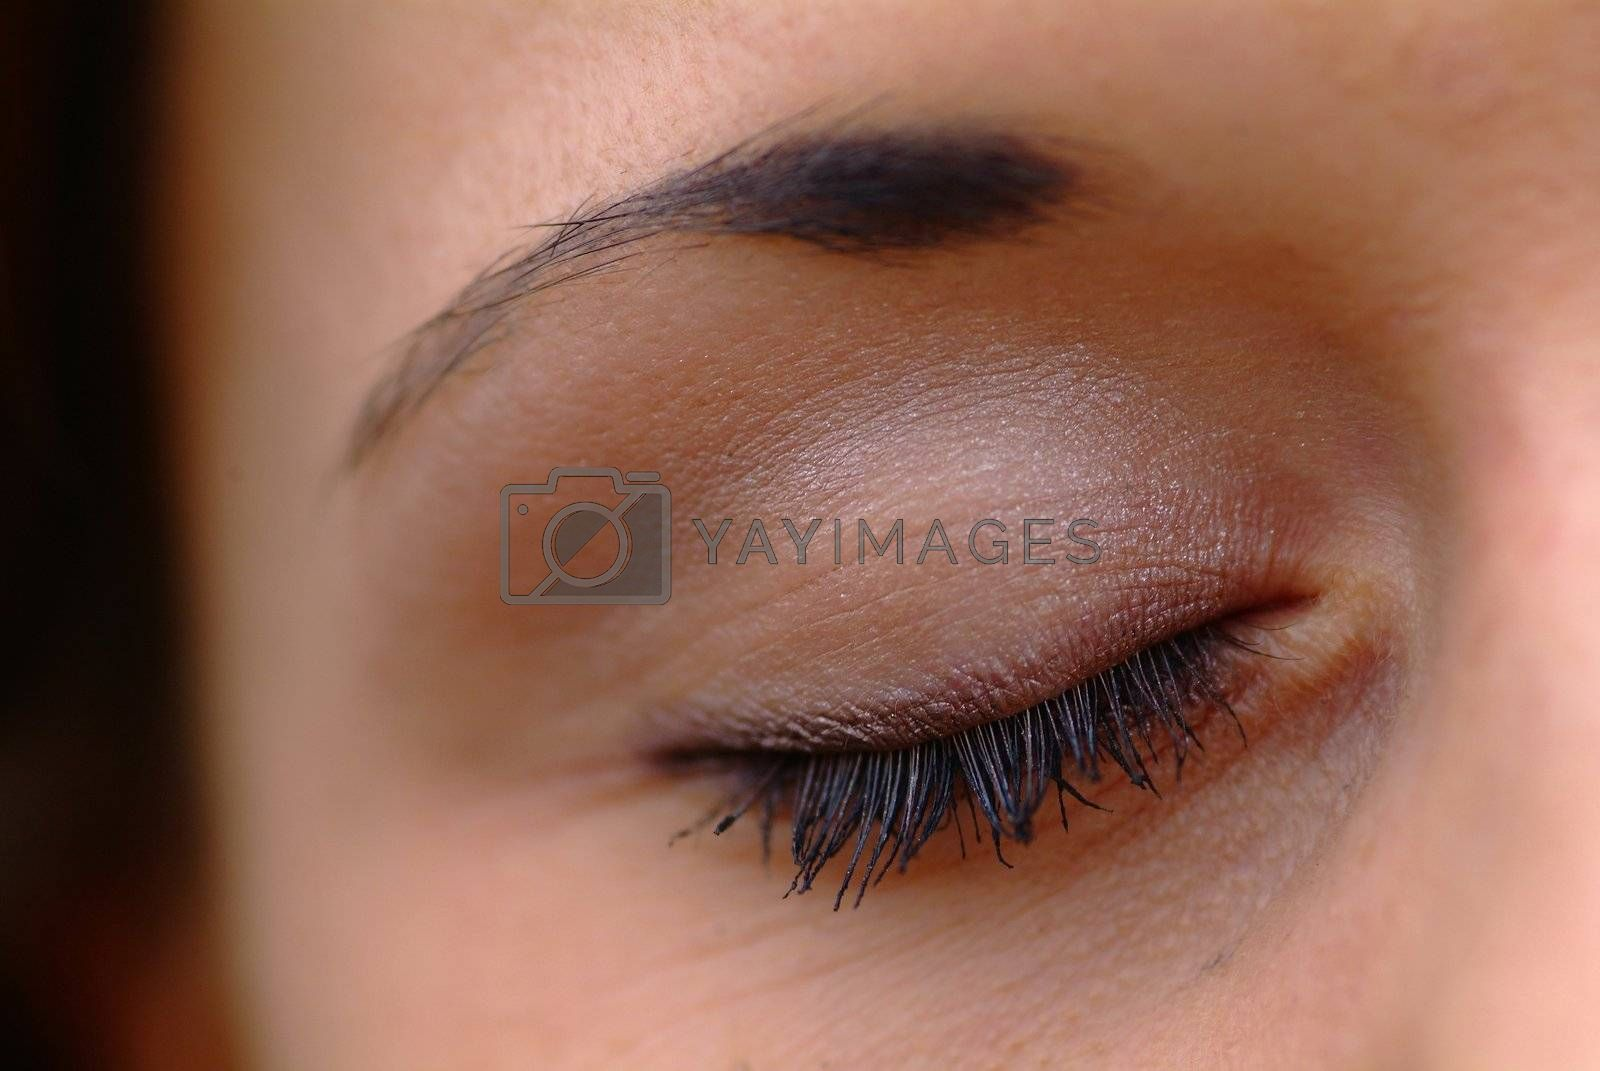 Auge frau | woman eye by fotofritz